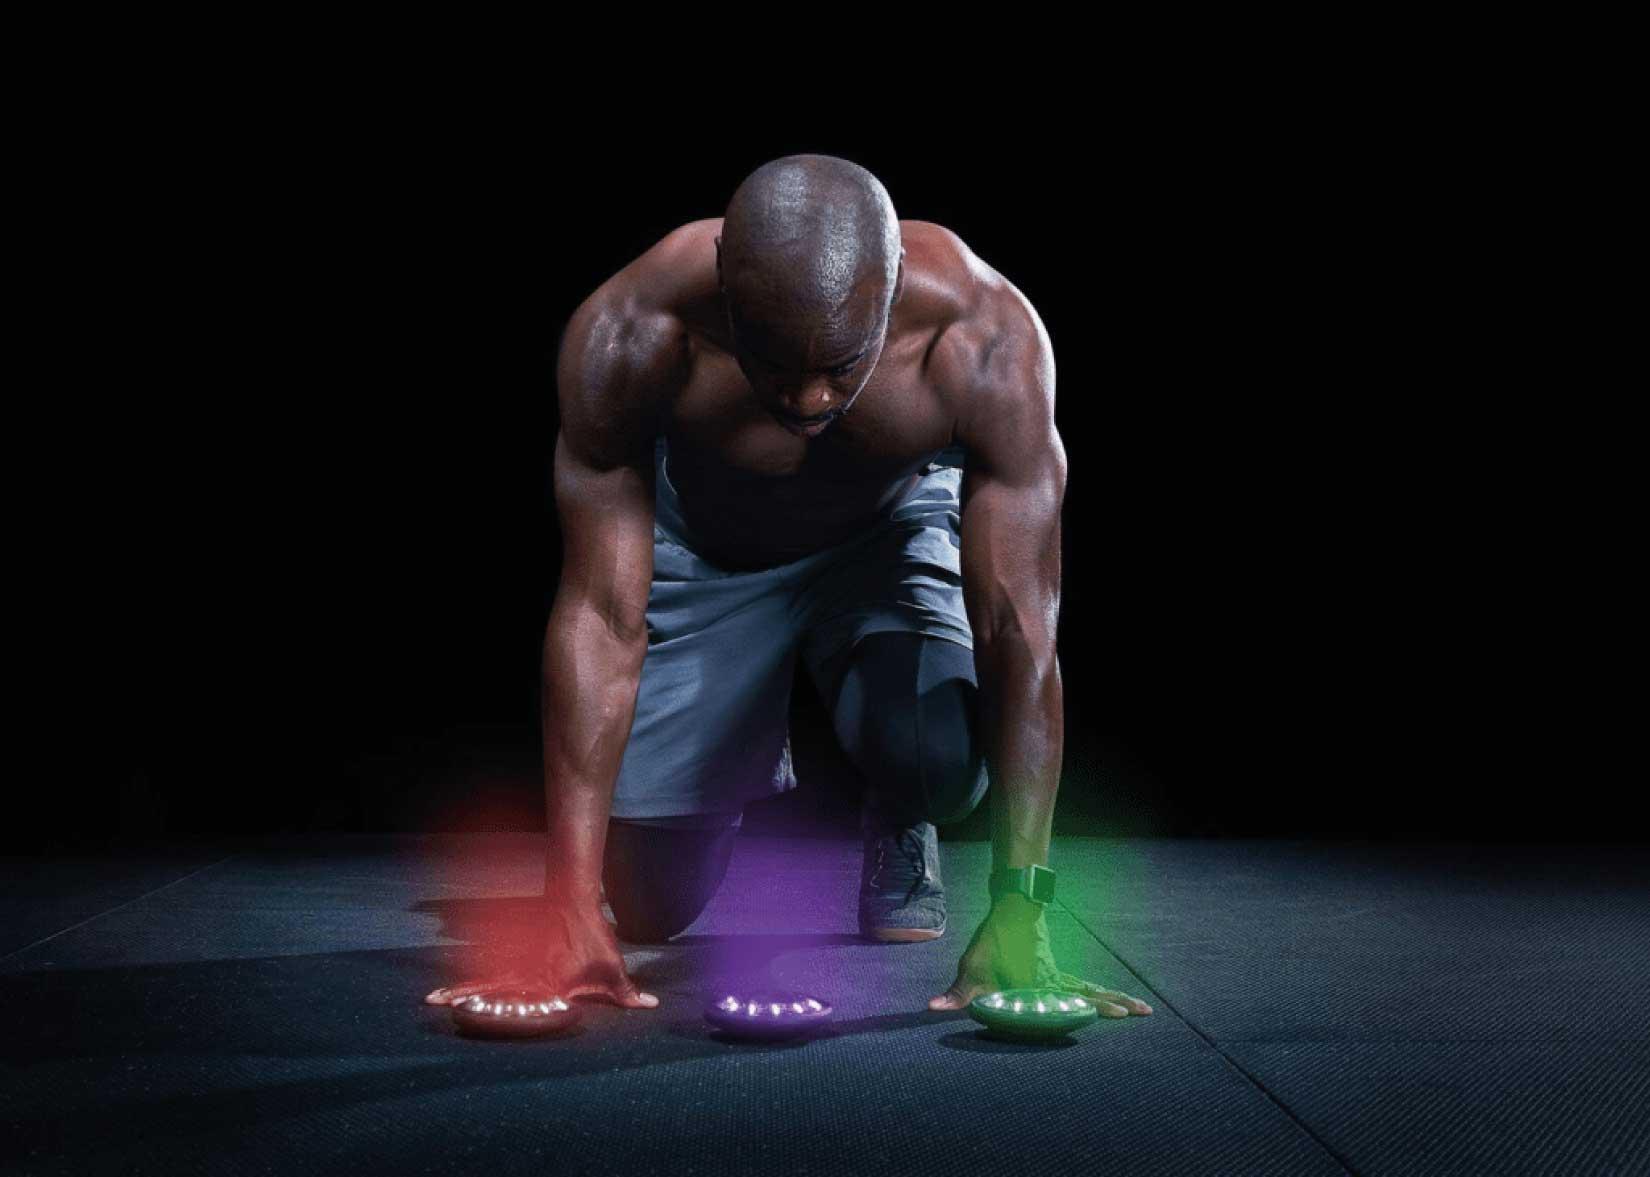 bg_fitlight-training-sports